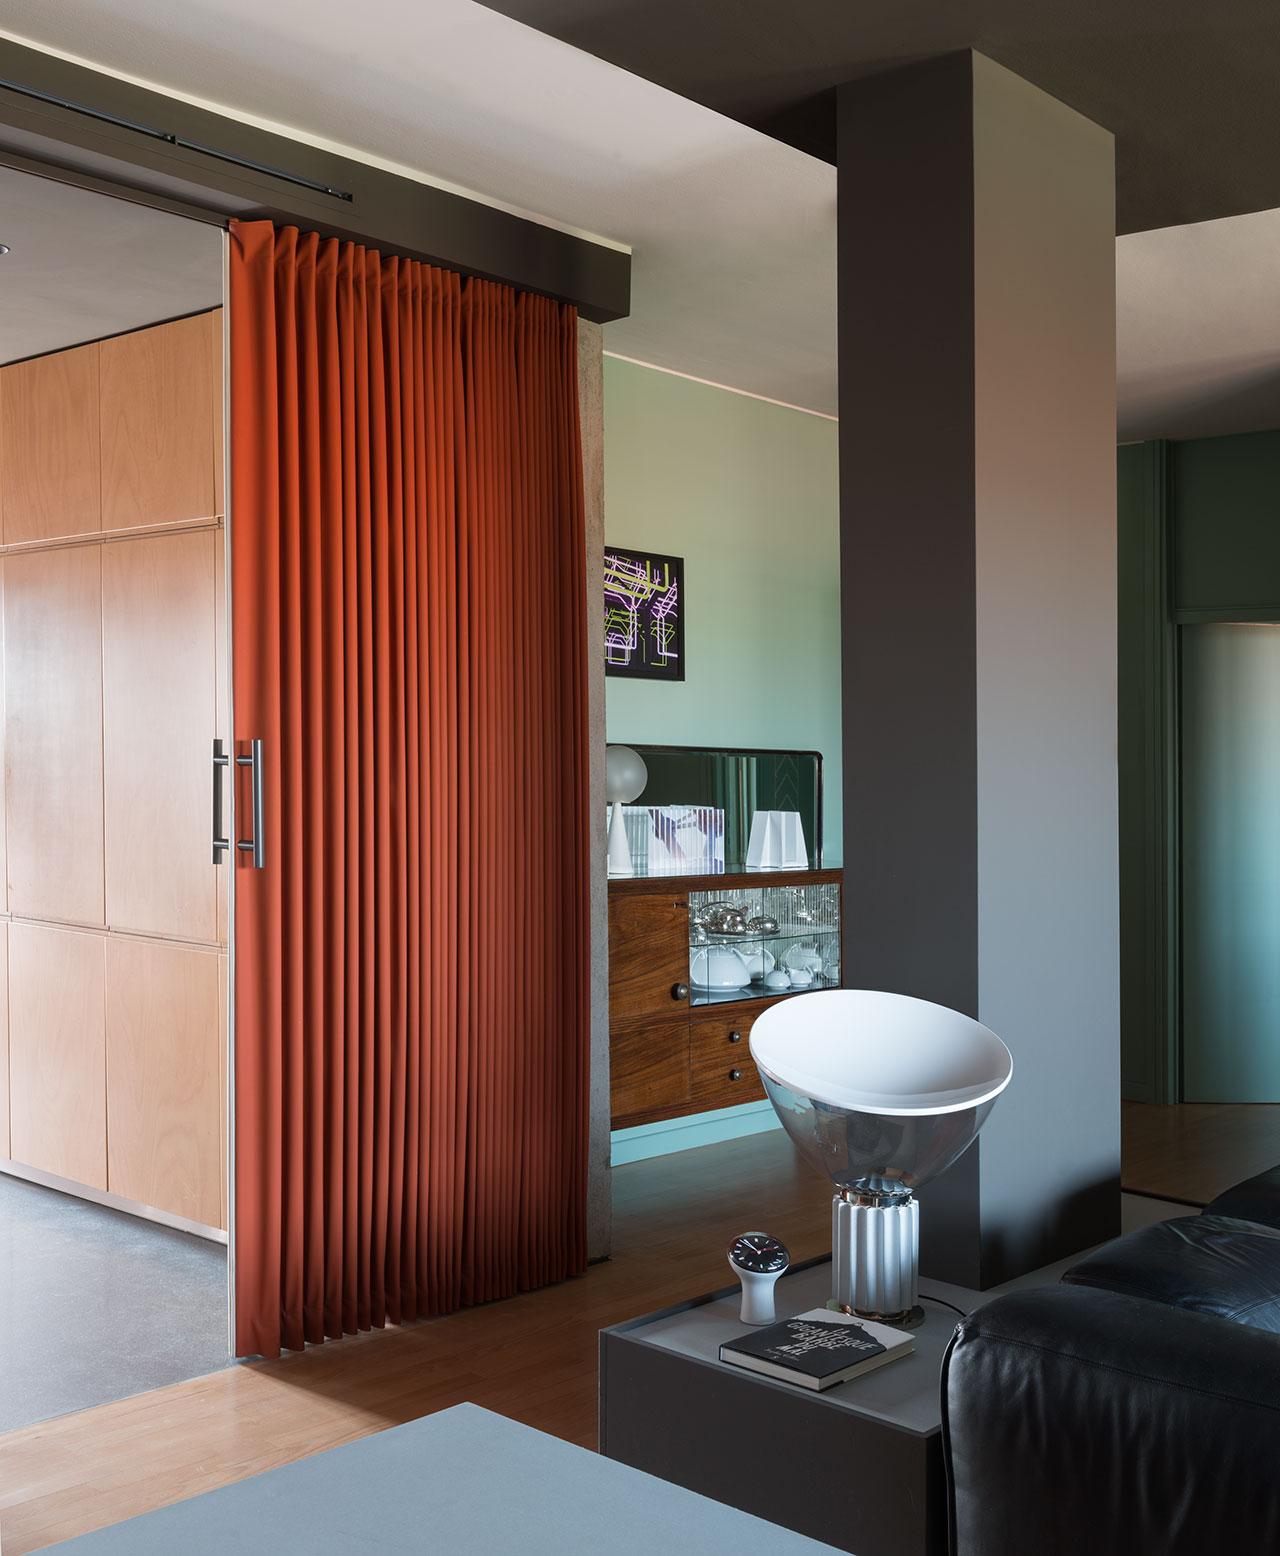 Calvi Brambilla apartment.Photo by Denise Bonenti.